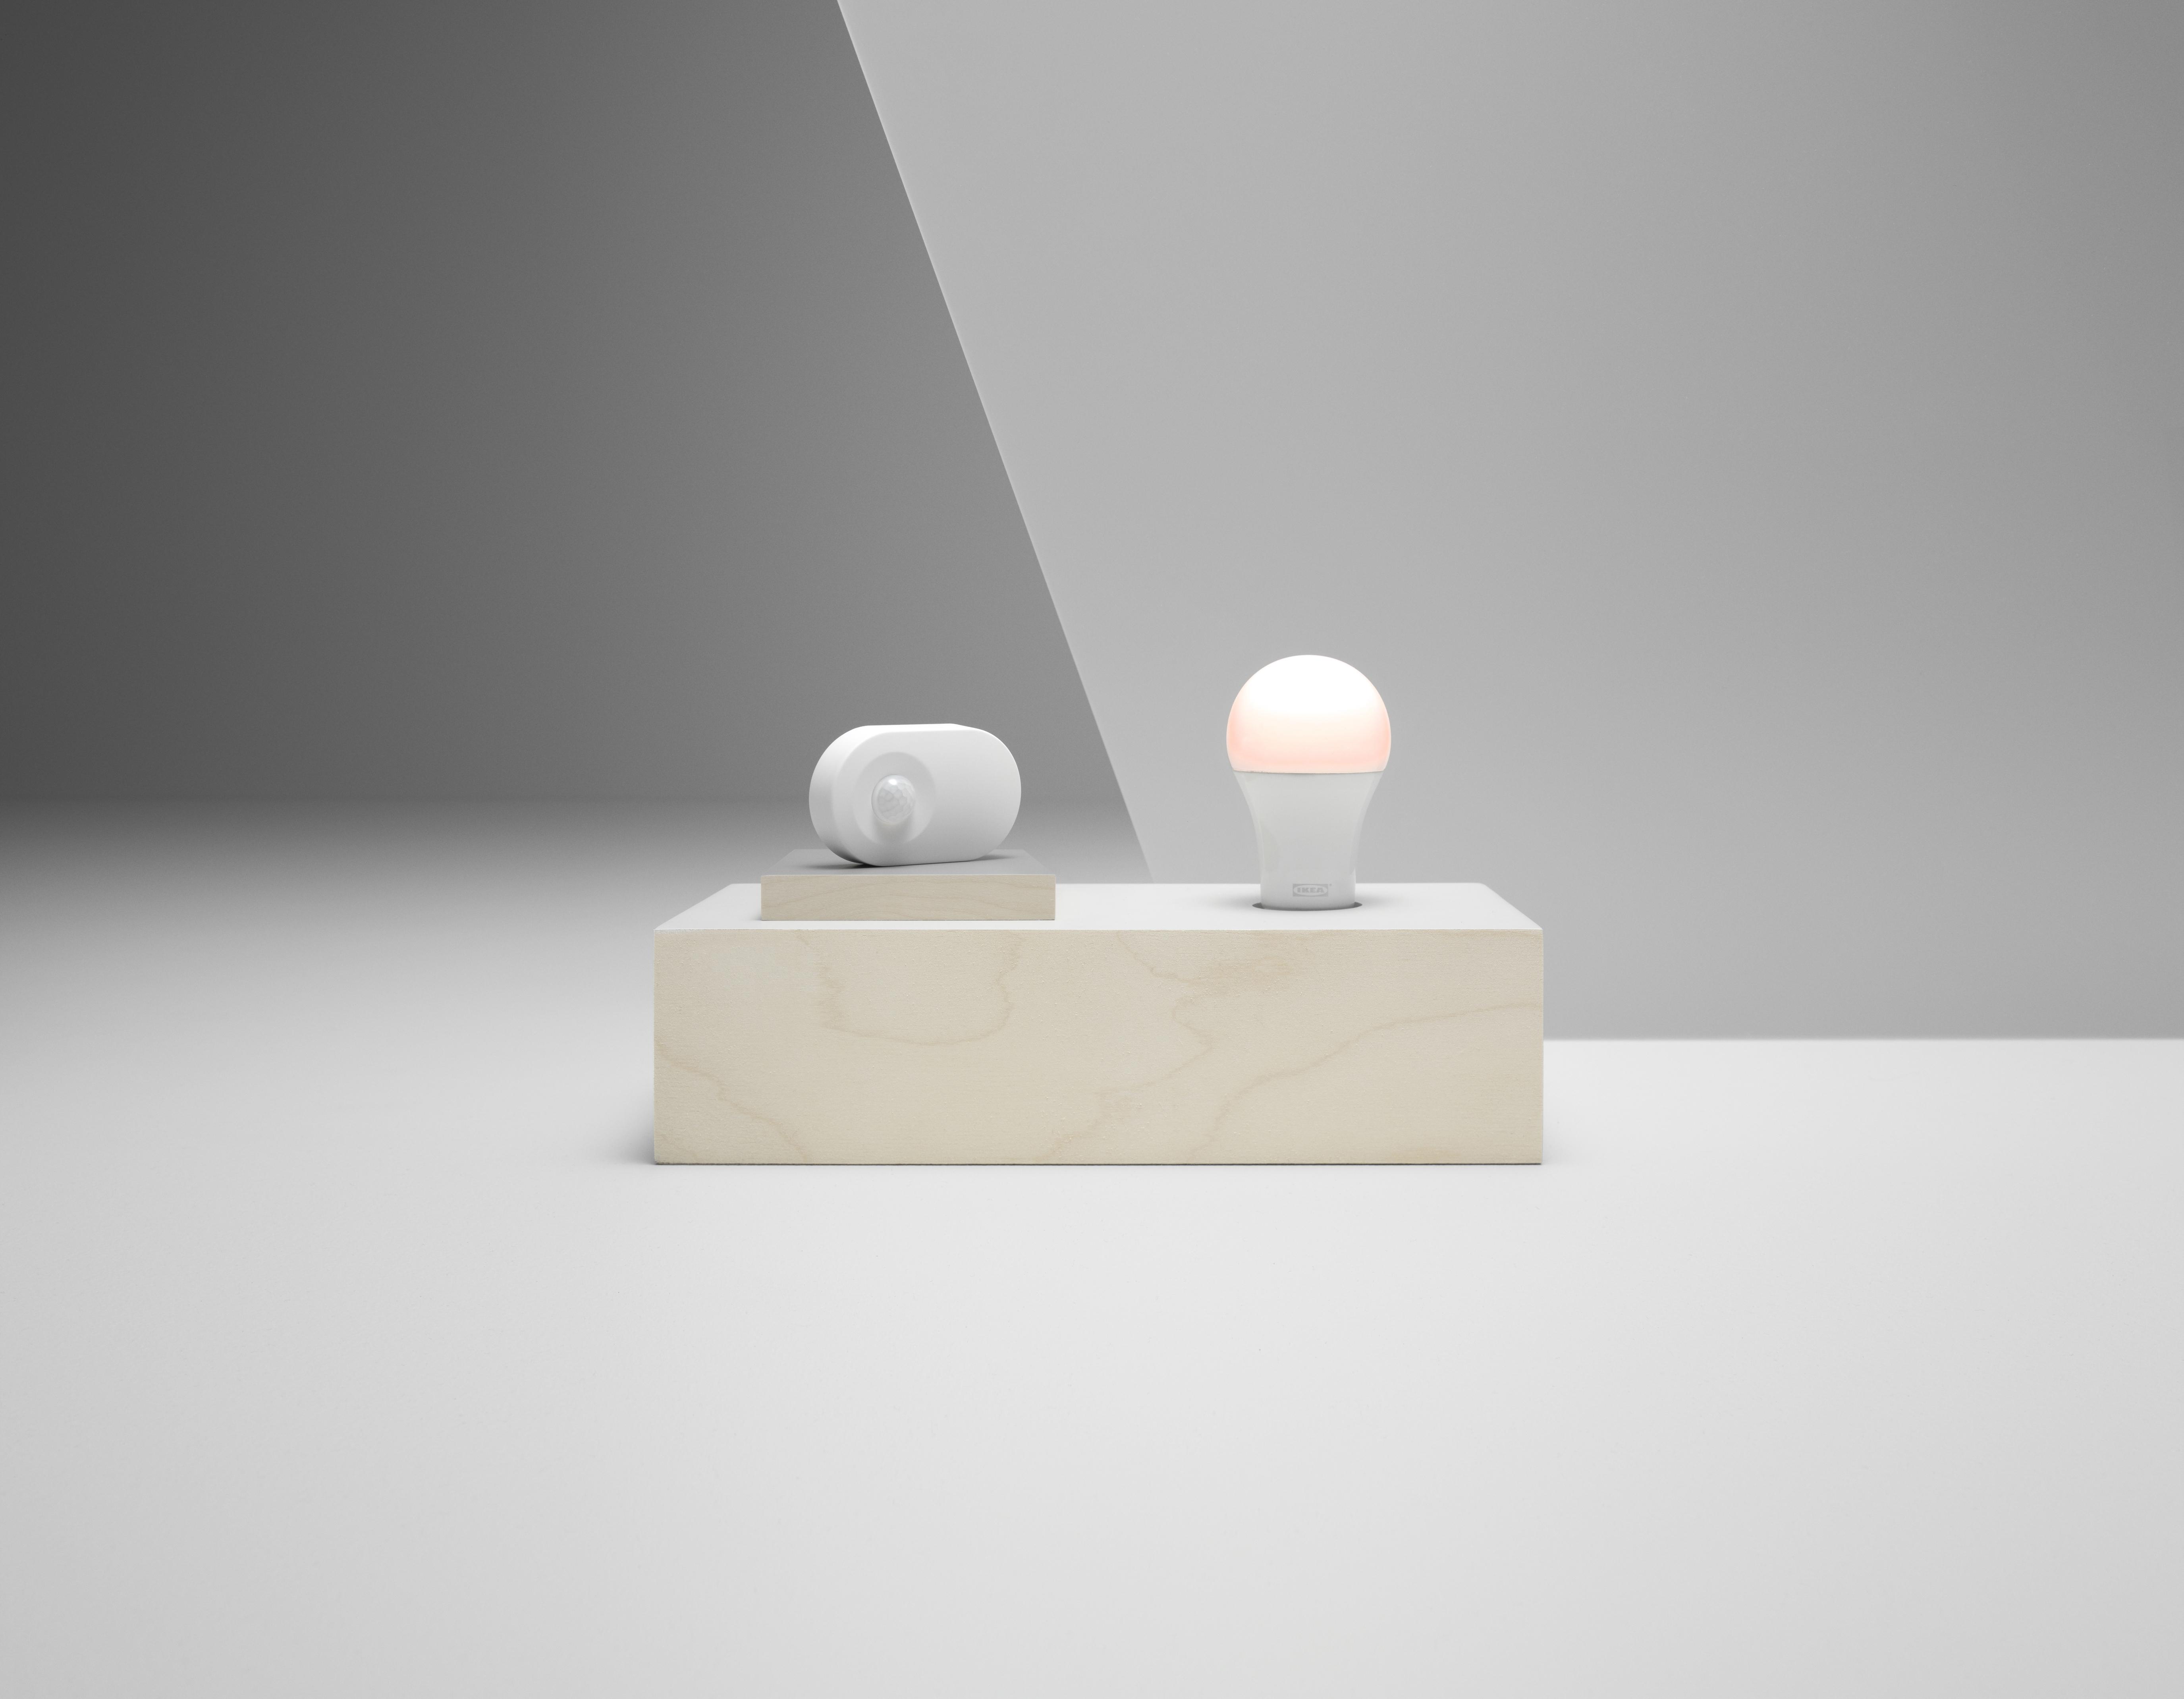 ikea smart home beleuchtung tr dfri kommt jetzt nach. Black Bedroom Furniture Sets. Home Design Ideas